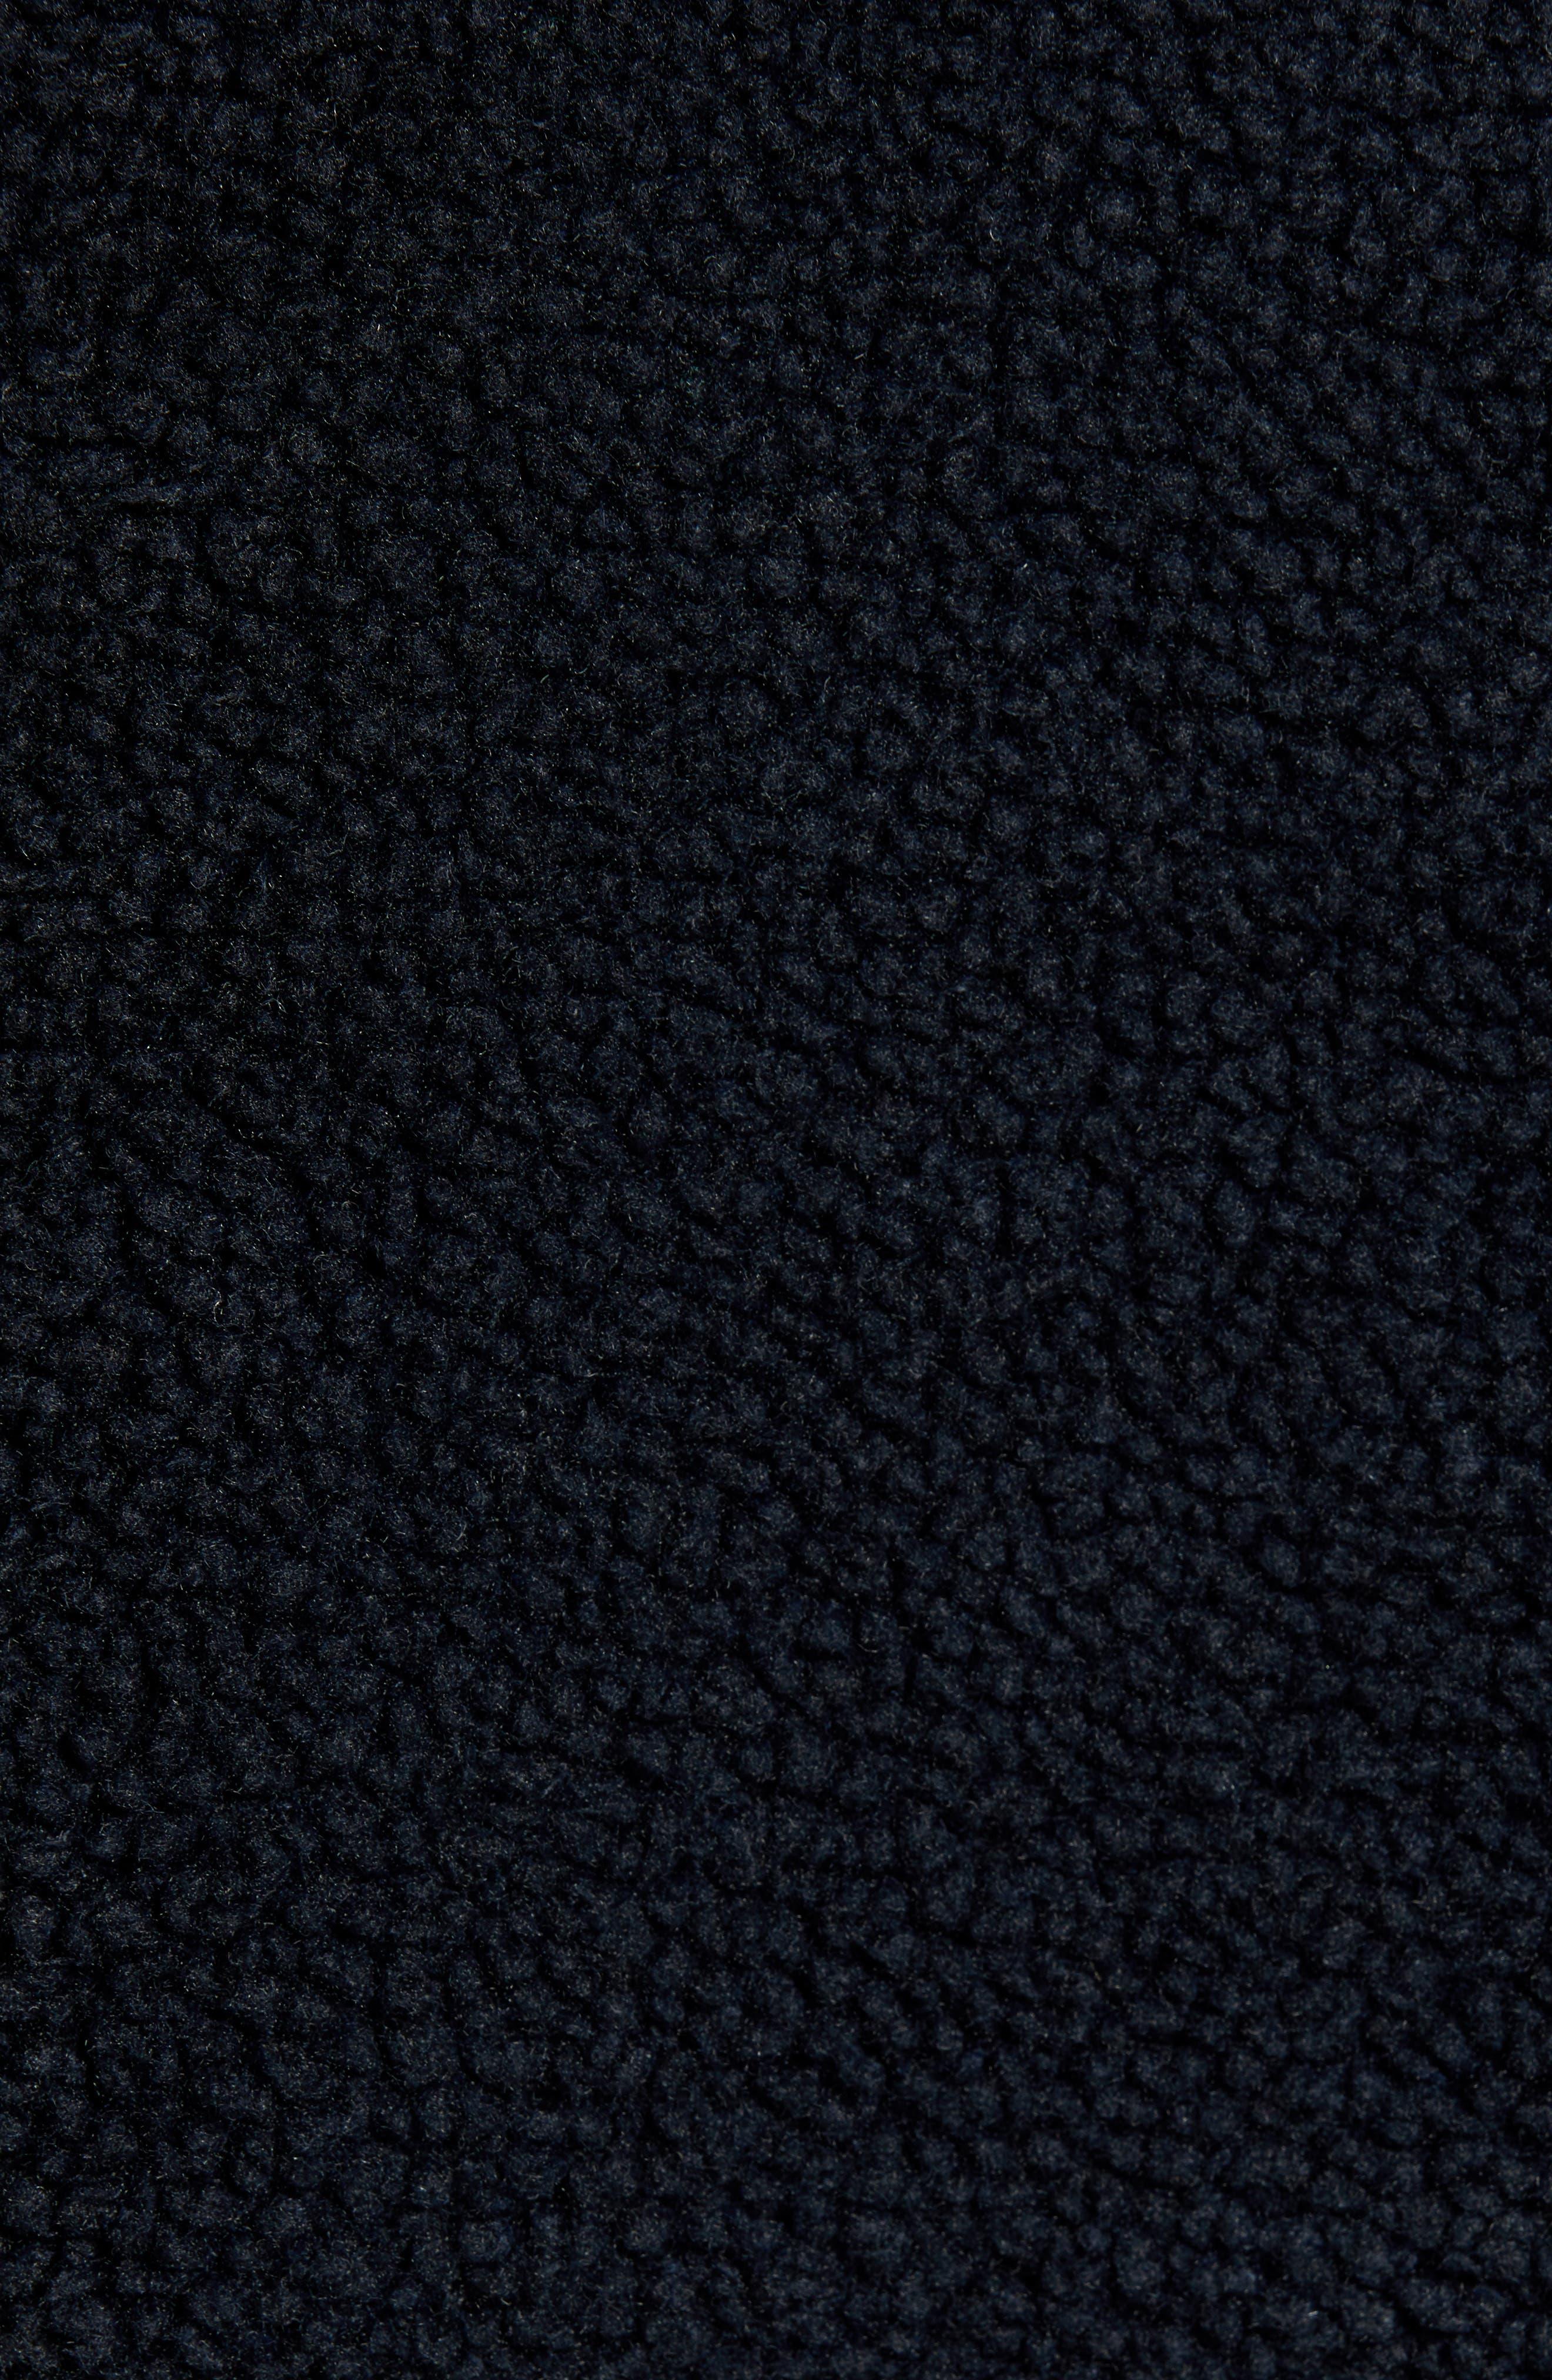 THEORY, Polar Fleece Reversible Zip Hoodie, Alternate thumbnail 7, color, 476